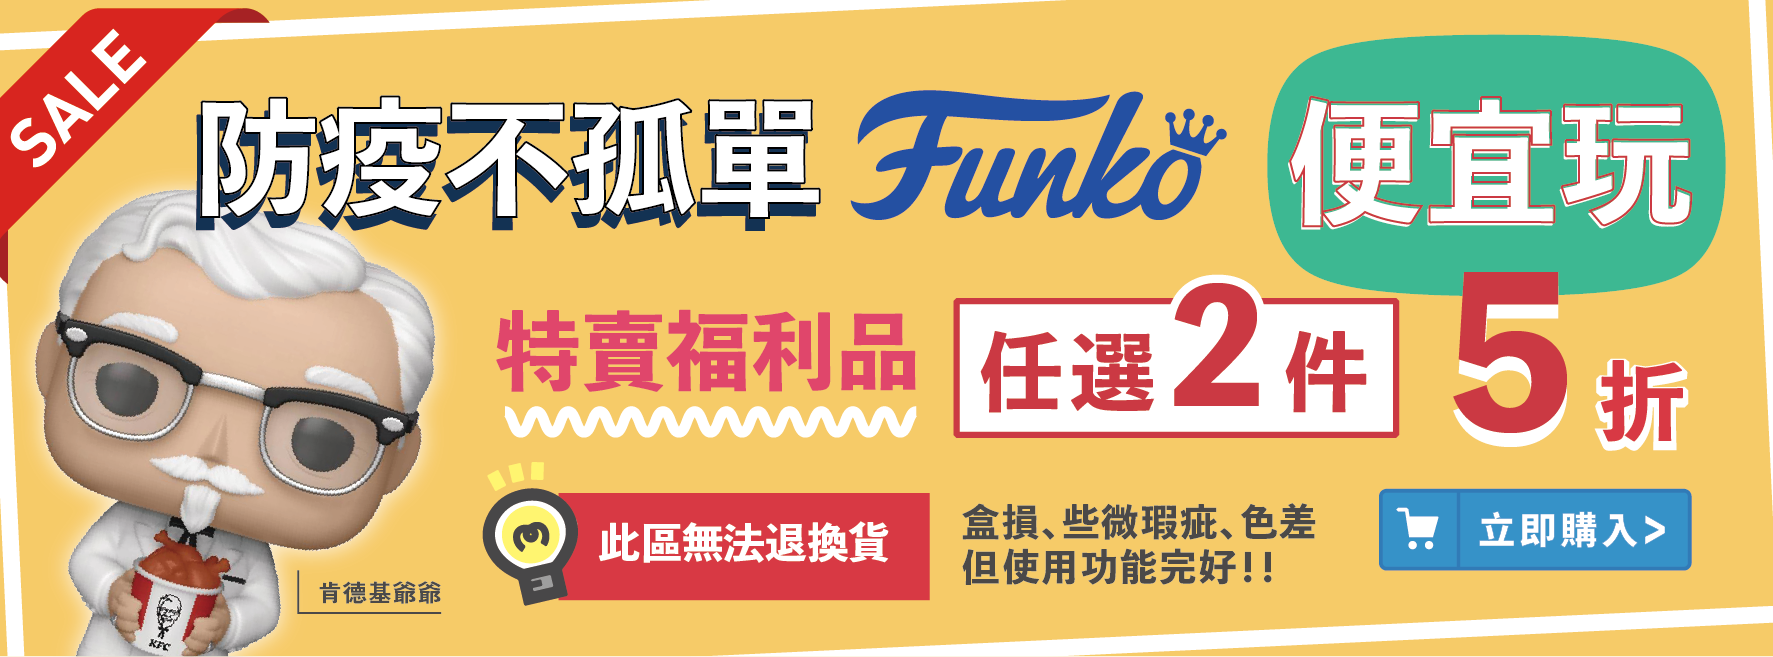 ✰ 防疫不孤單-Funko便宜玩 ✰ - HobbyToy 哈玩具